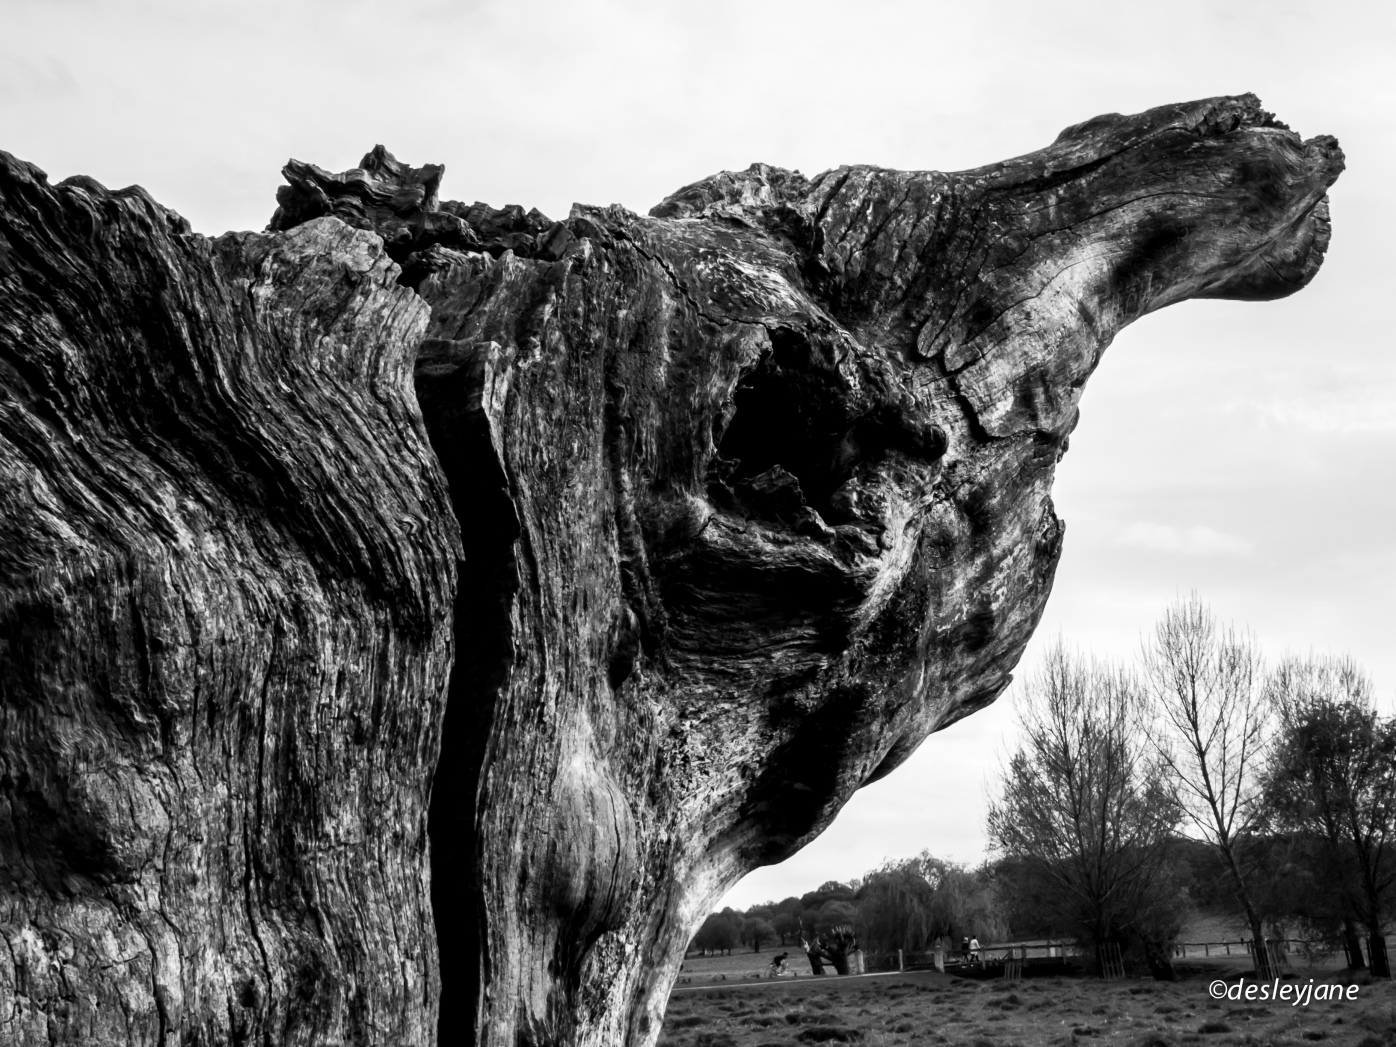 The split tree.